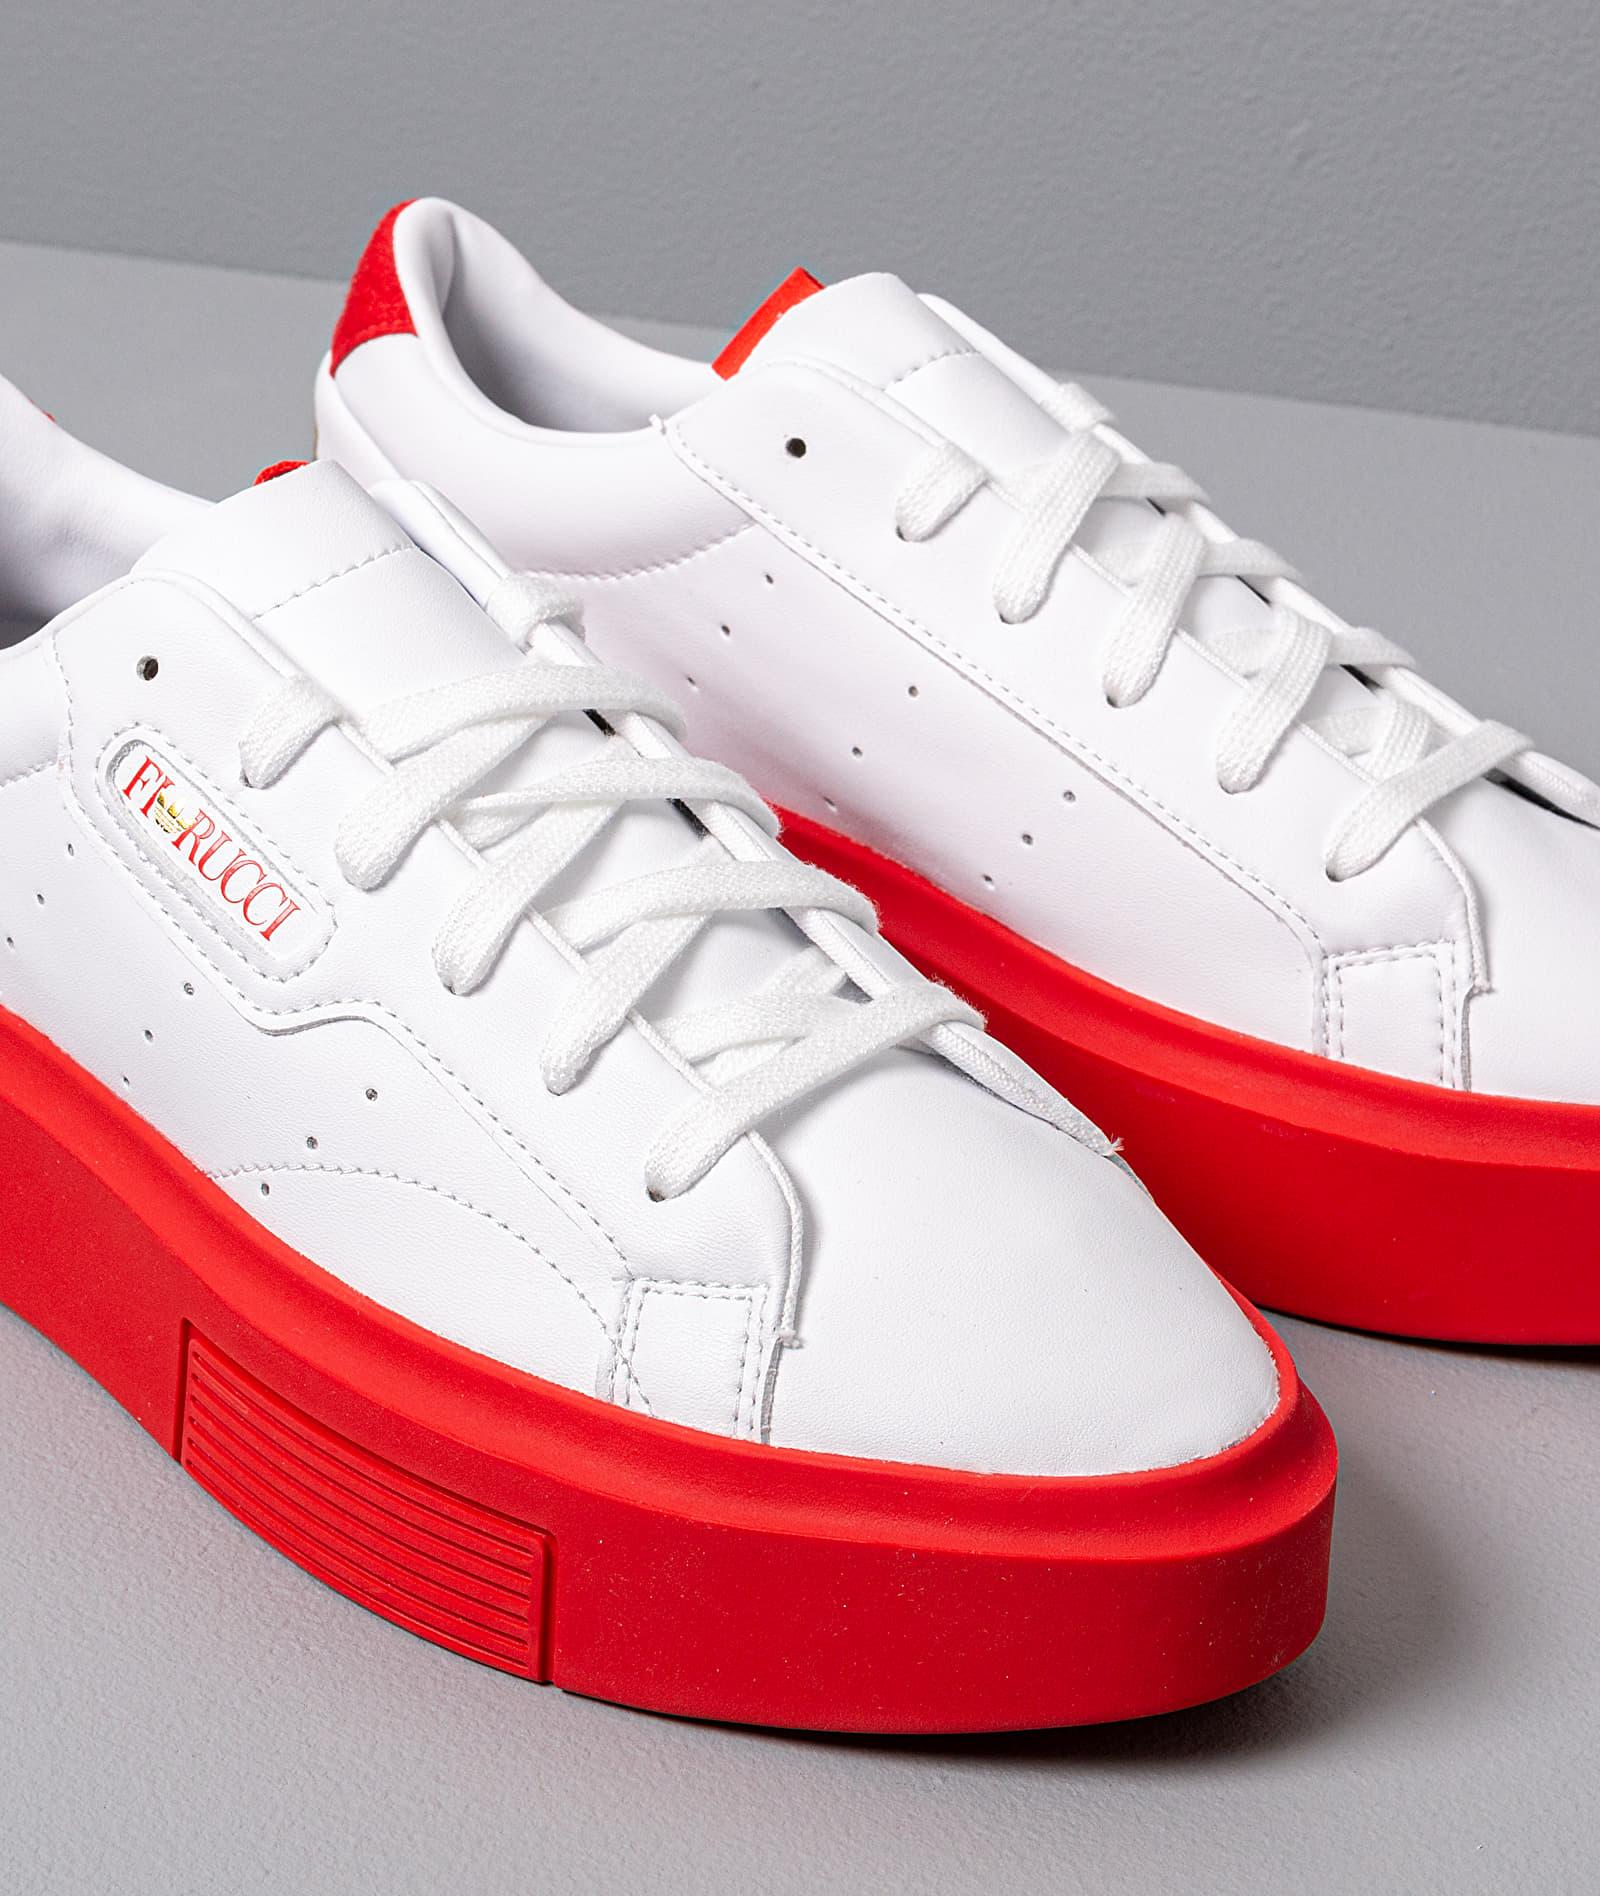 adidas Originals Adidas X Fiorucci